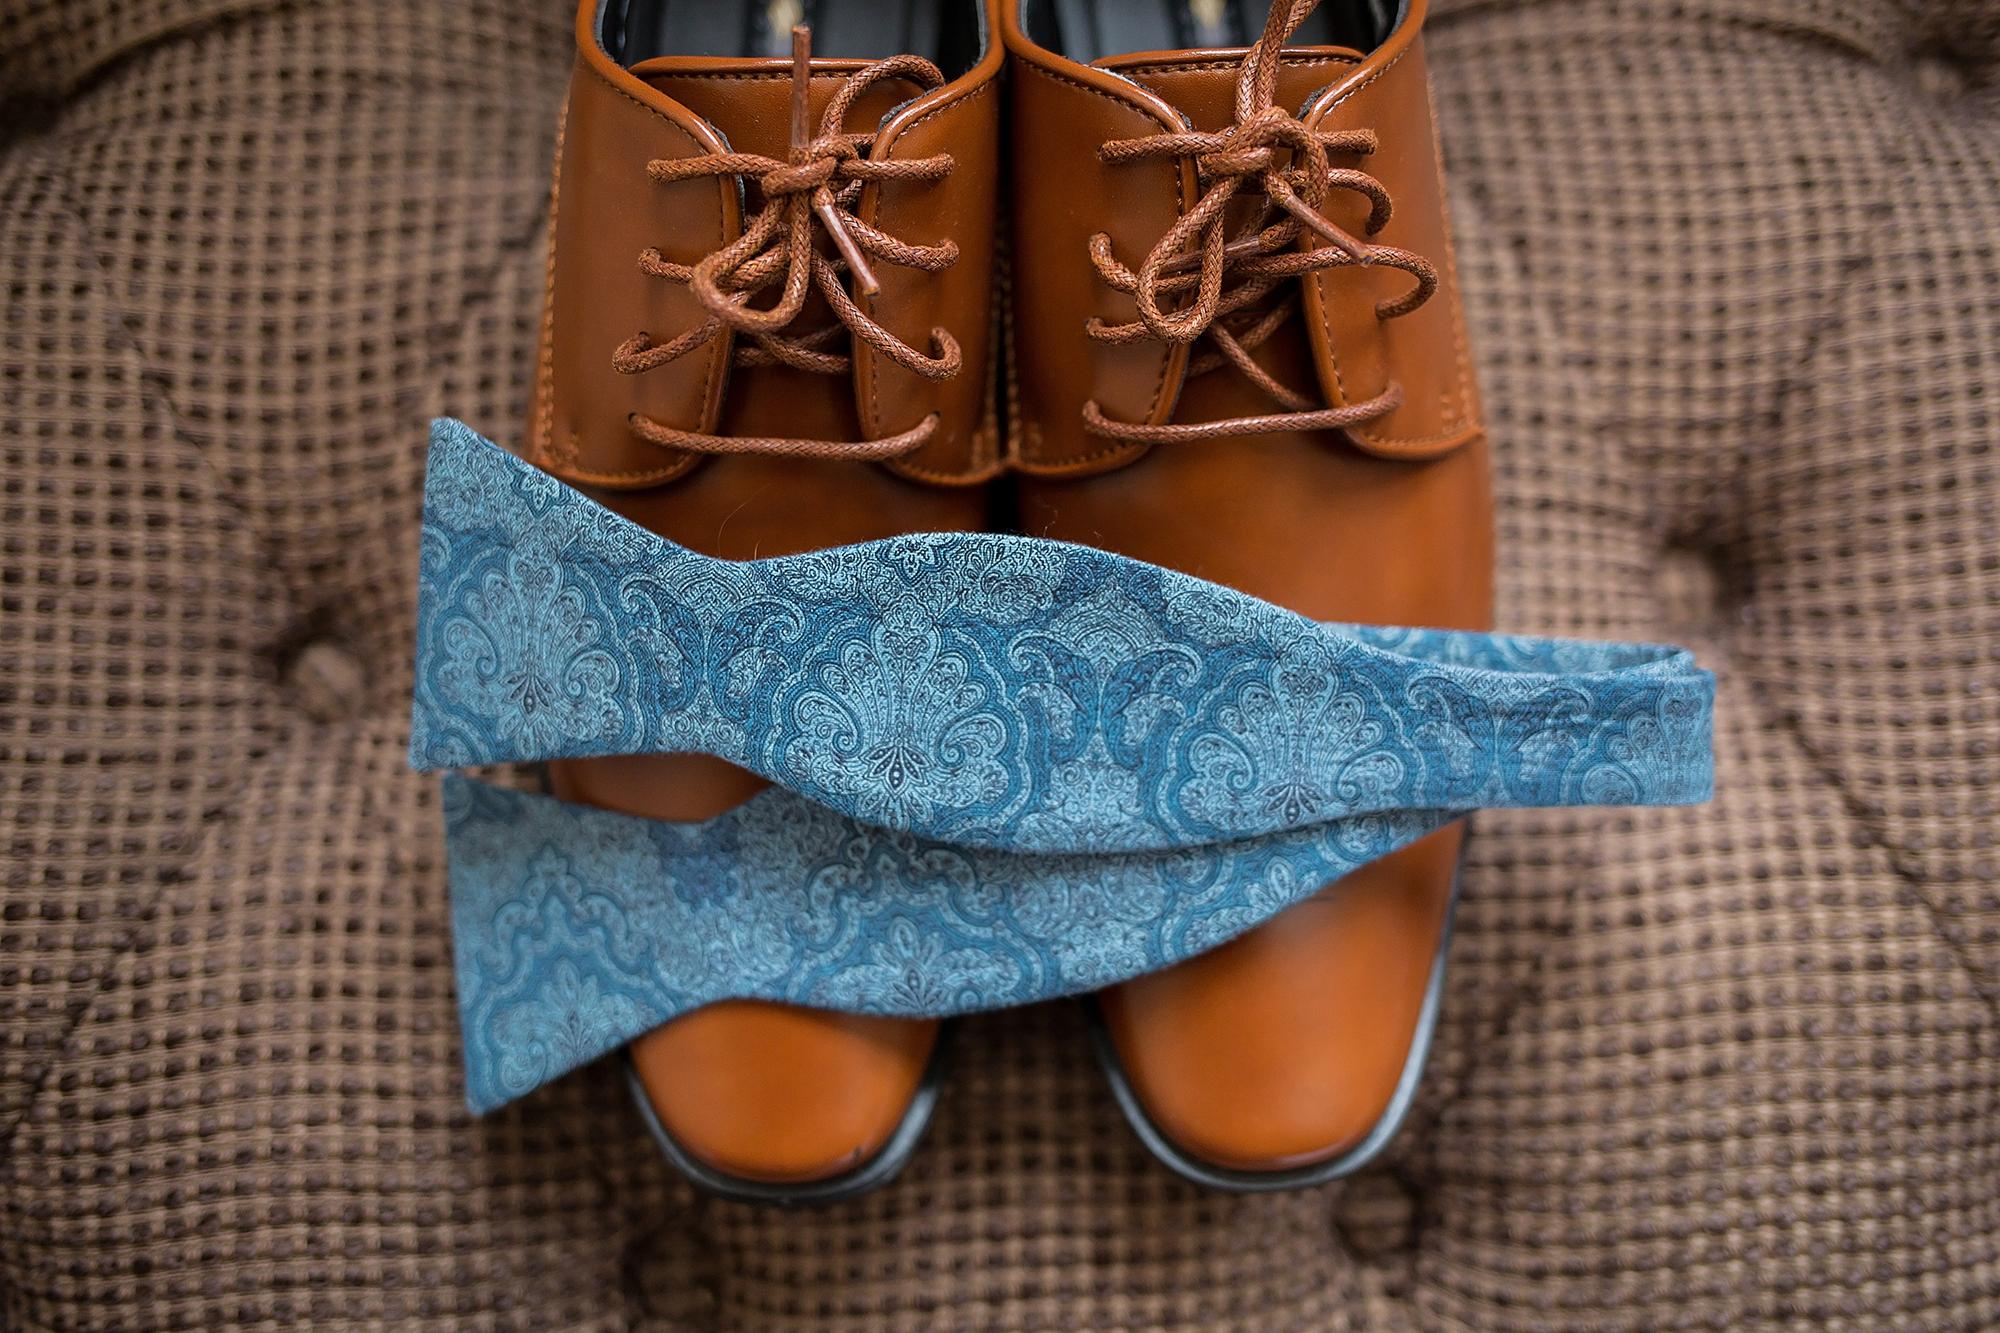 bow-tie-for-groomsmen.jpg